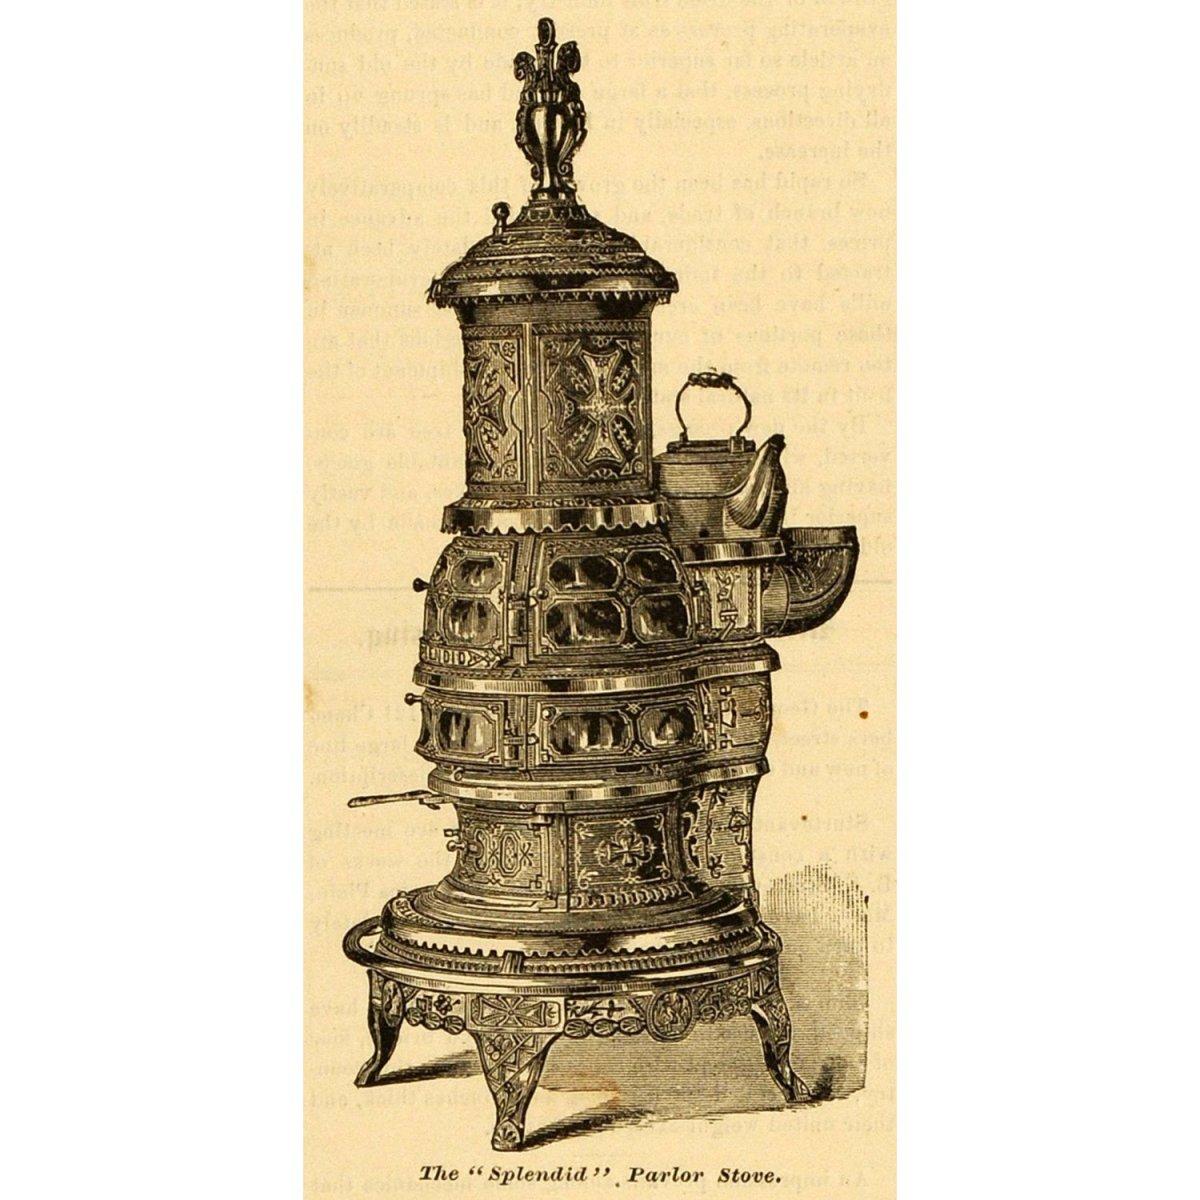 1881 Print Antique Splendid Parlor Stove Design Fuller Warren Co Troy New York